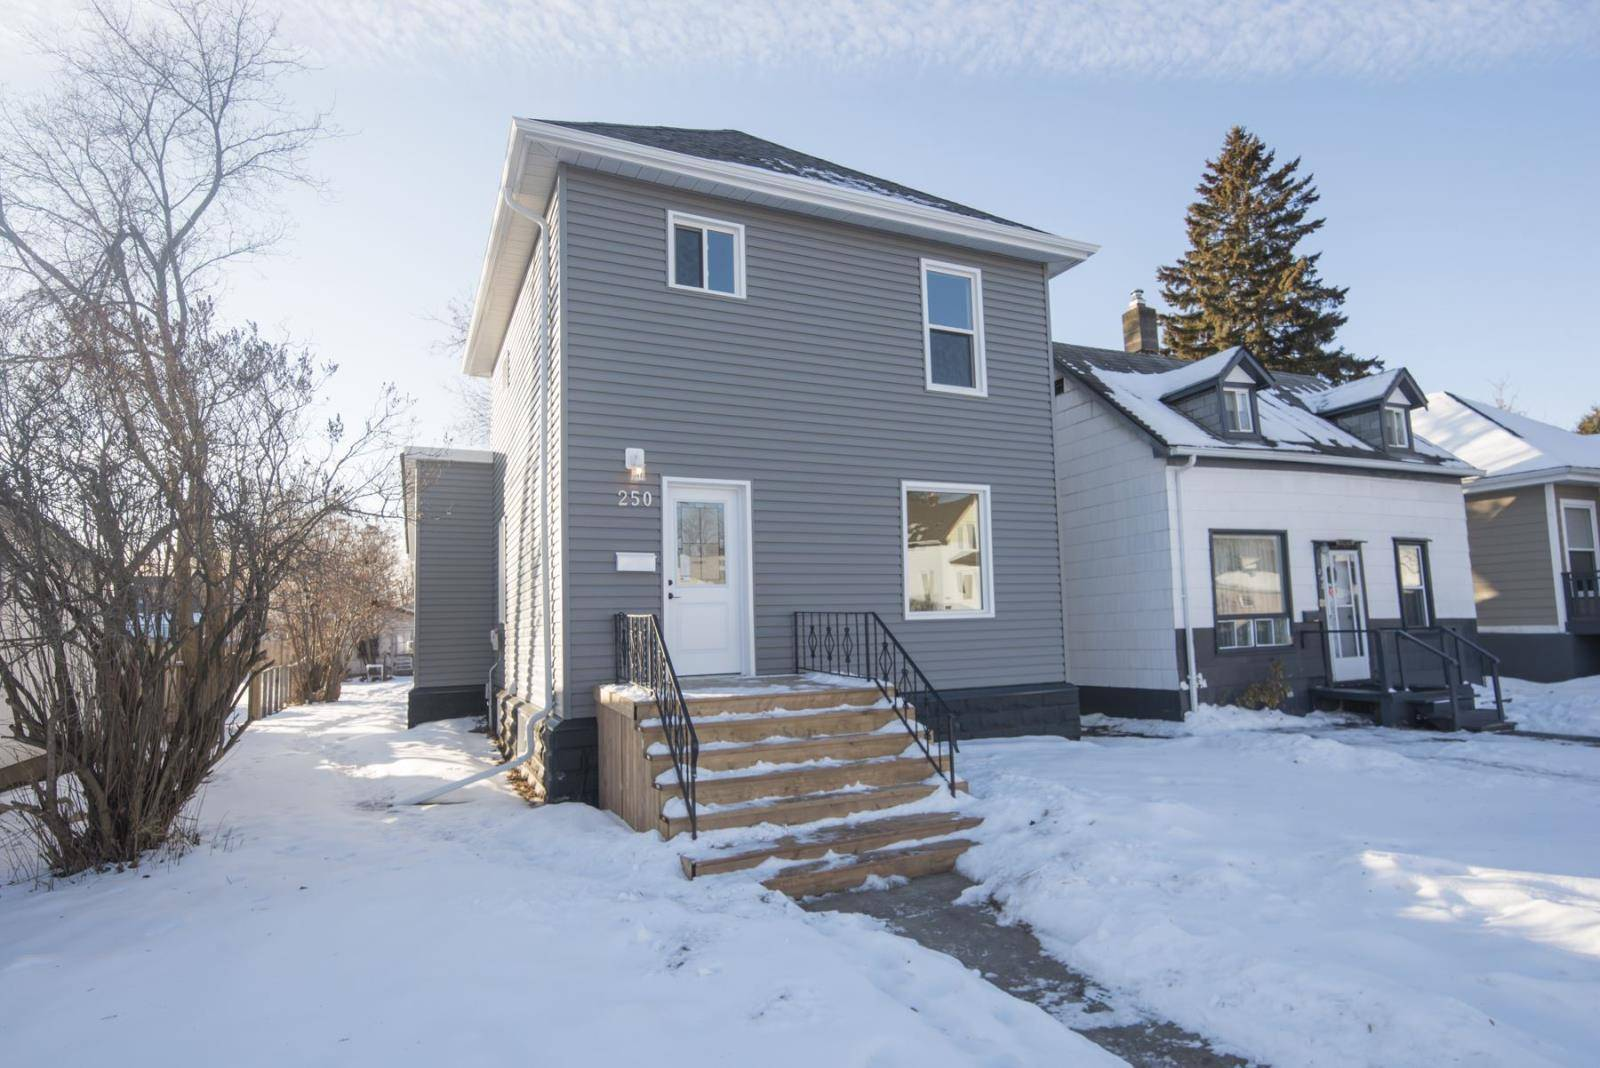 House for sale at 250 Amelia Street St E Thunder Bay Ontario - MLS: TB200014